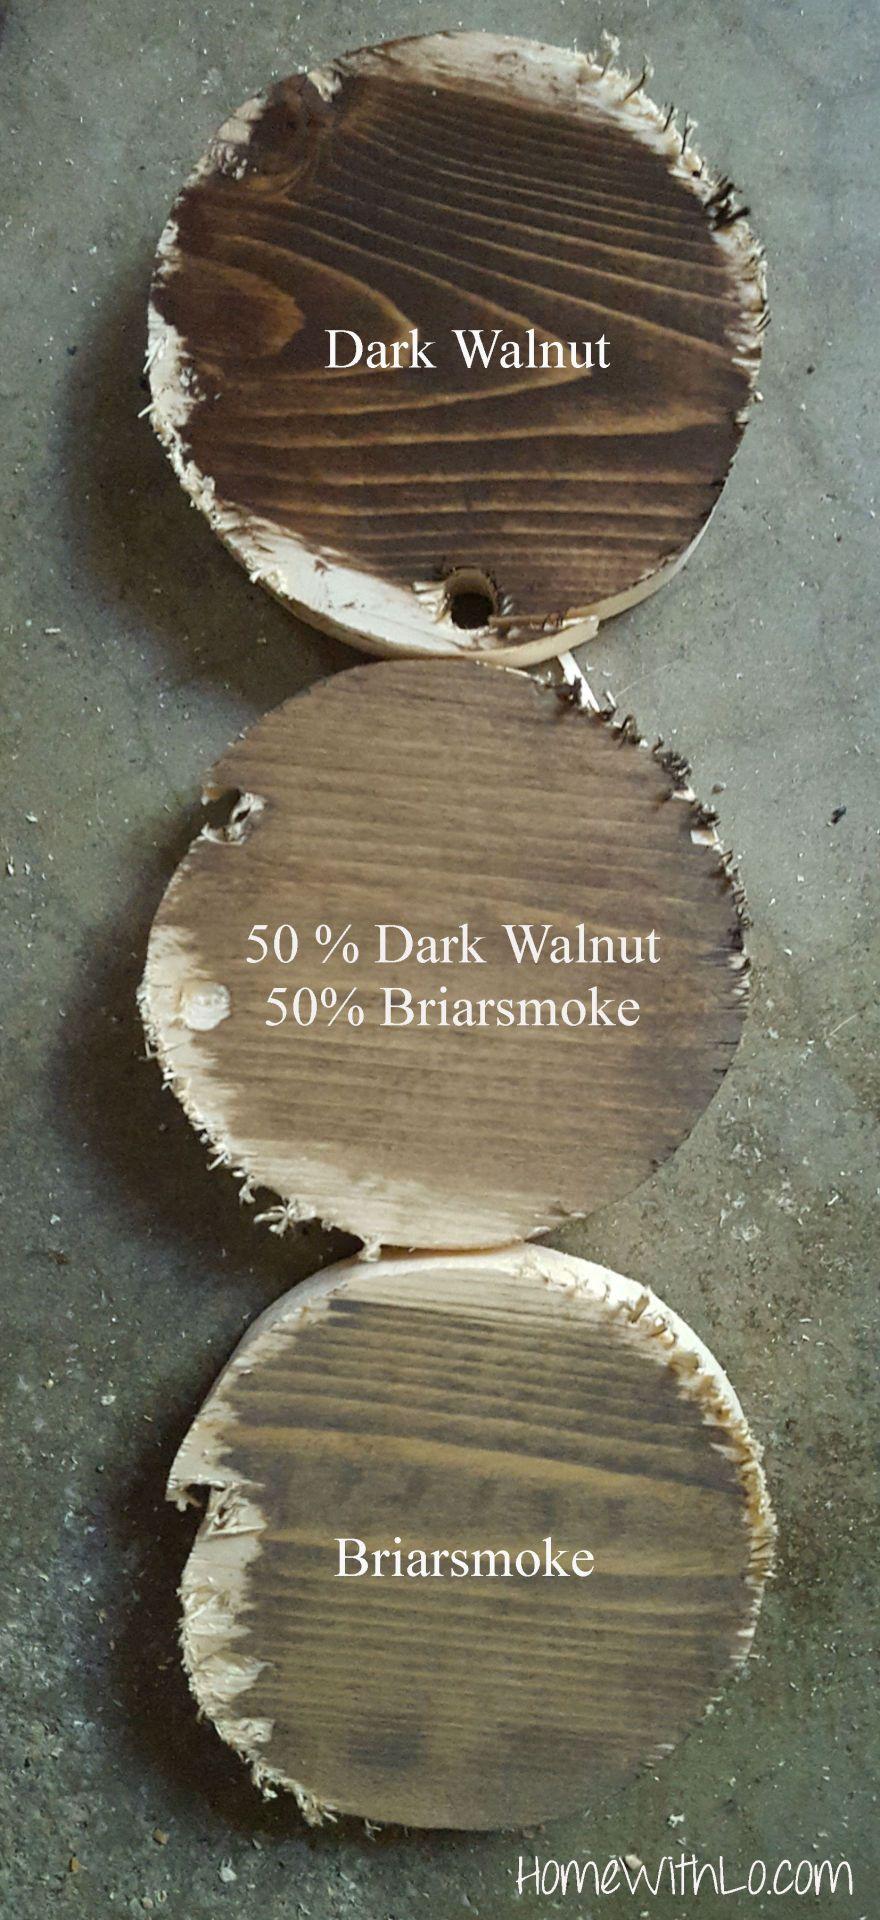 Varathane Wood Stain In Dark Walnut Briarsmoke And A Mix